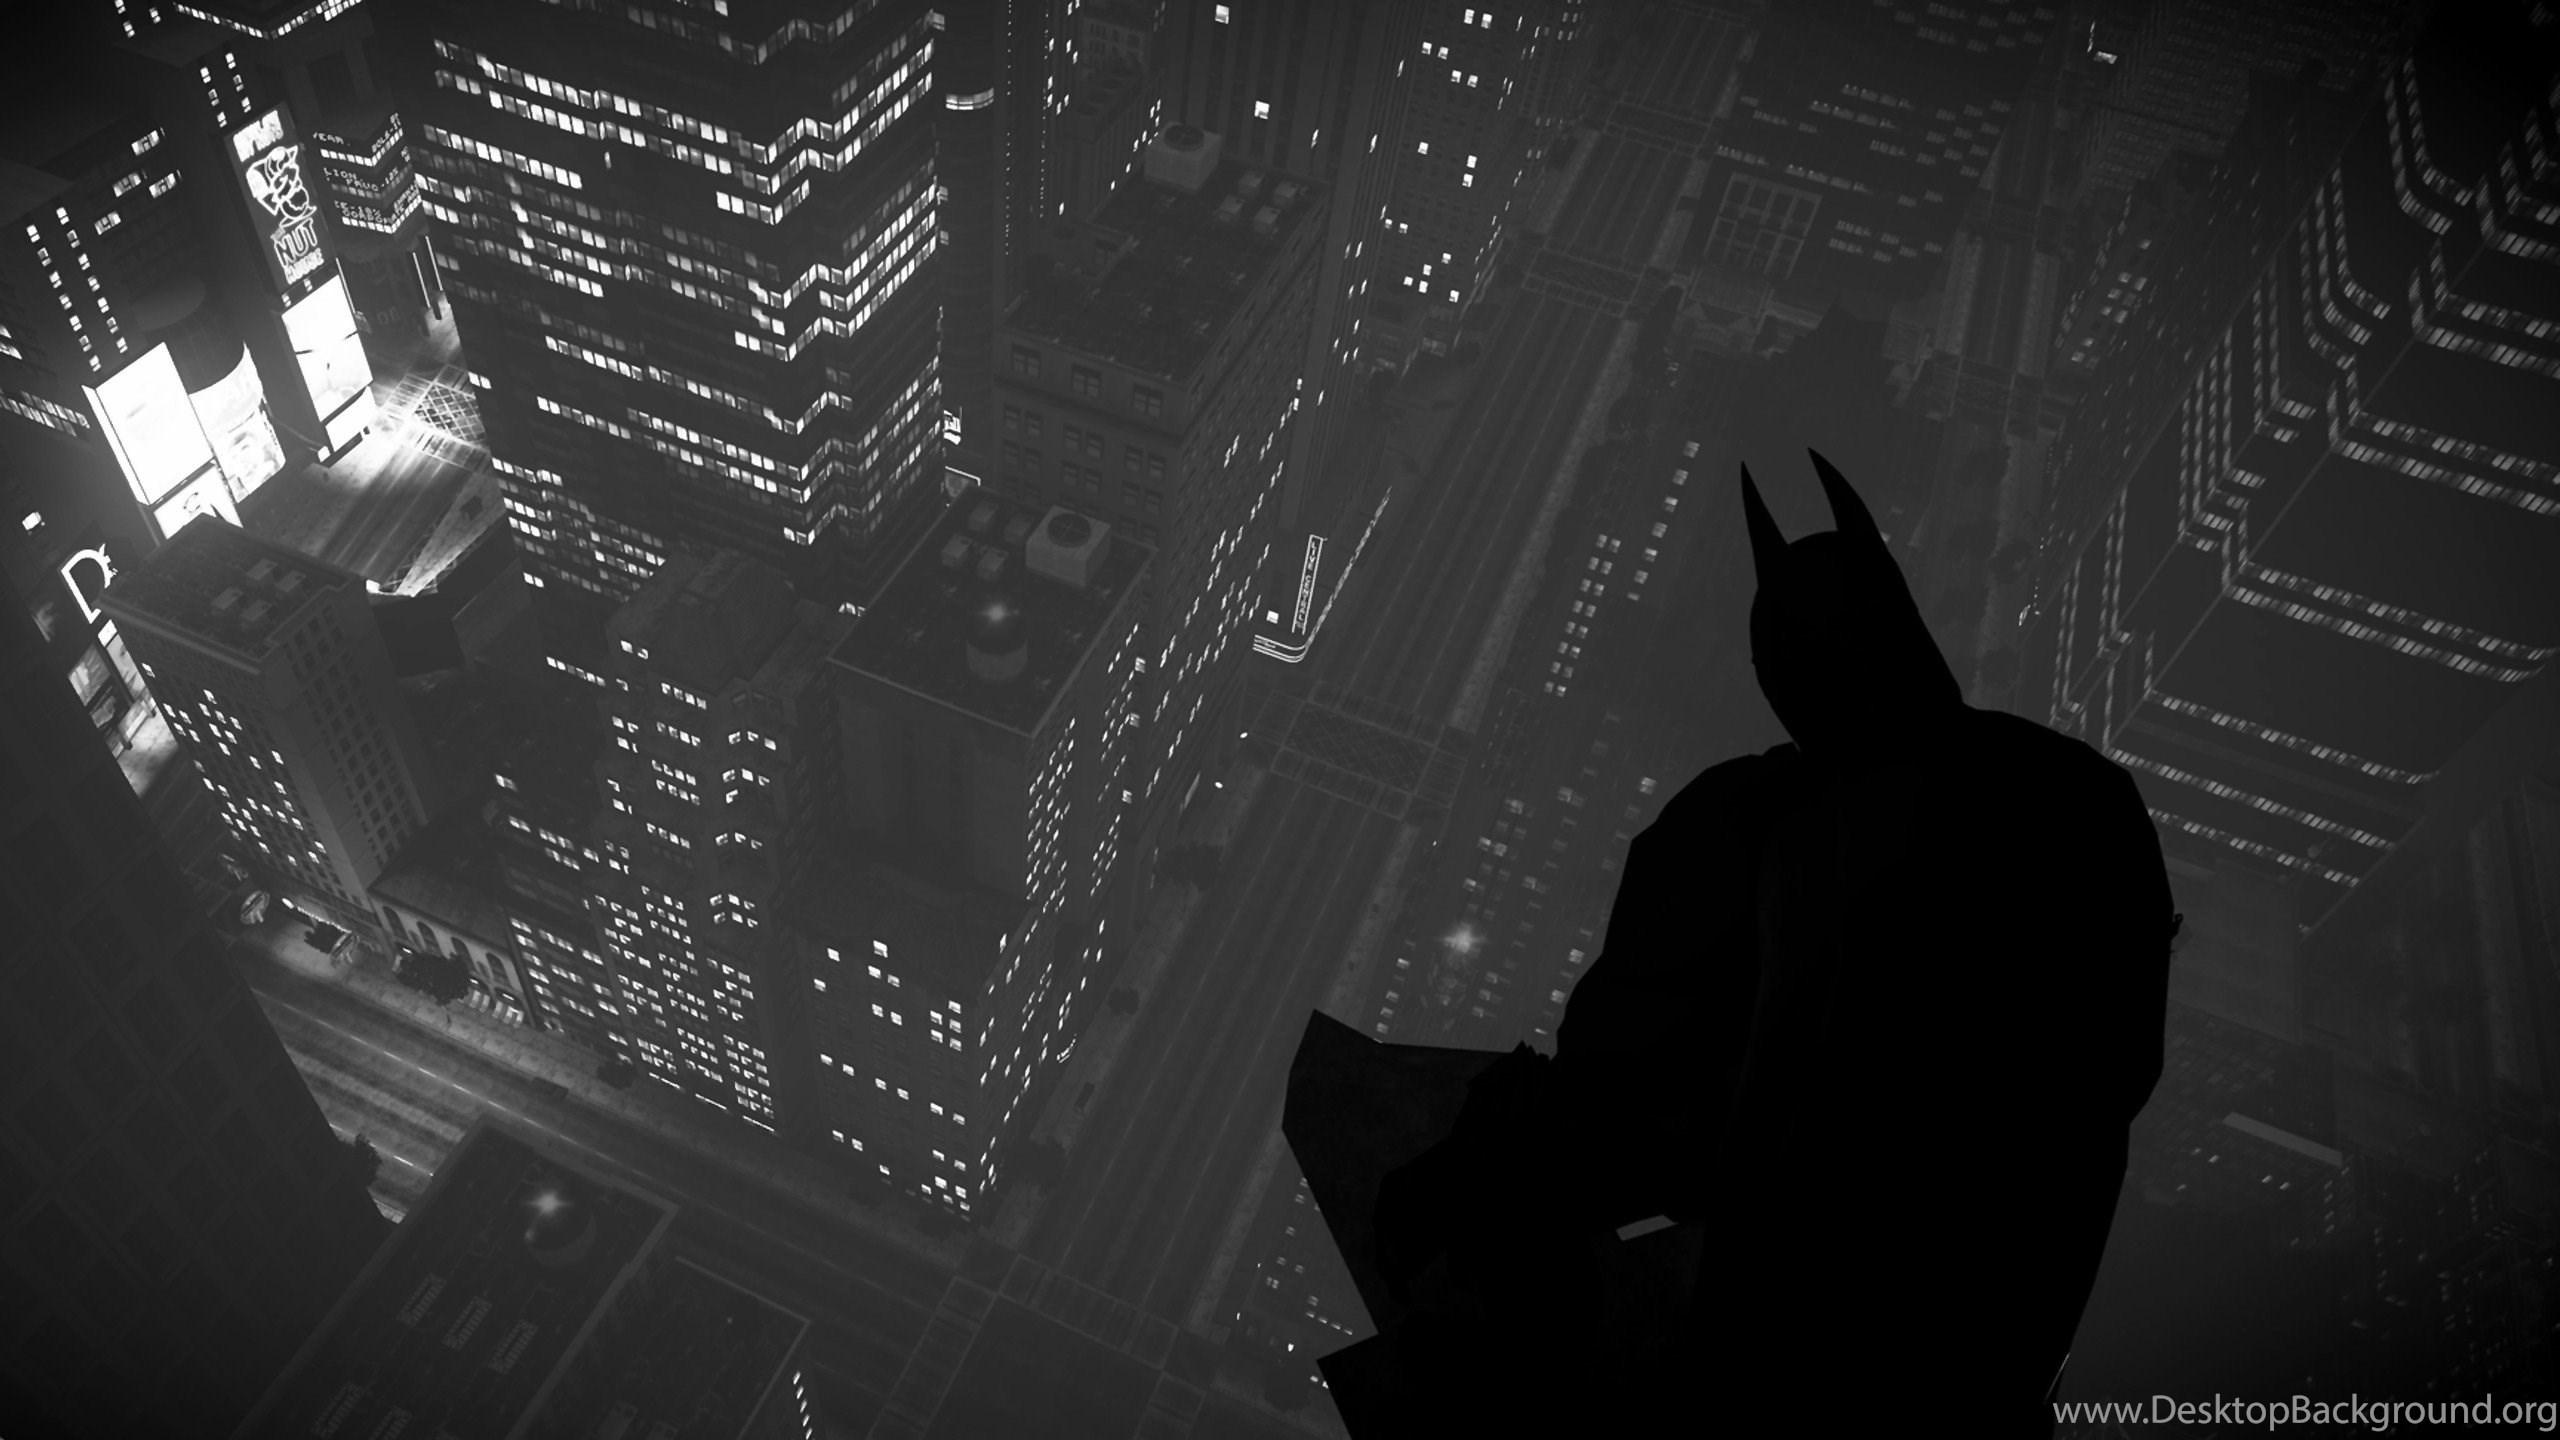 Batman Silhouette The Dark Knight Rises Wallpapers Desktop